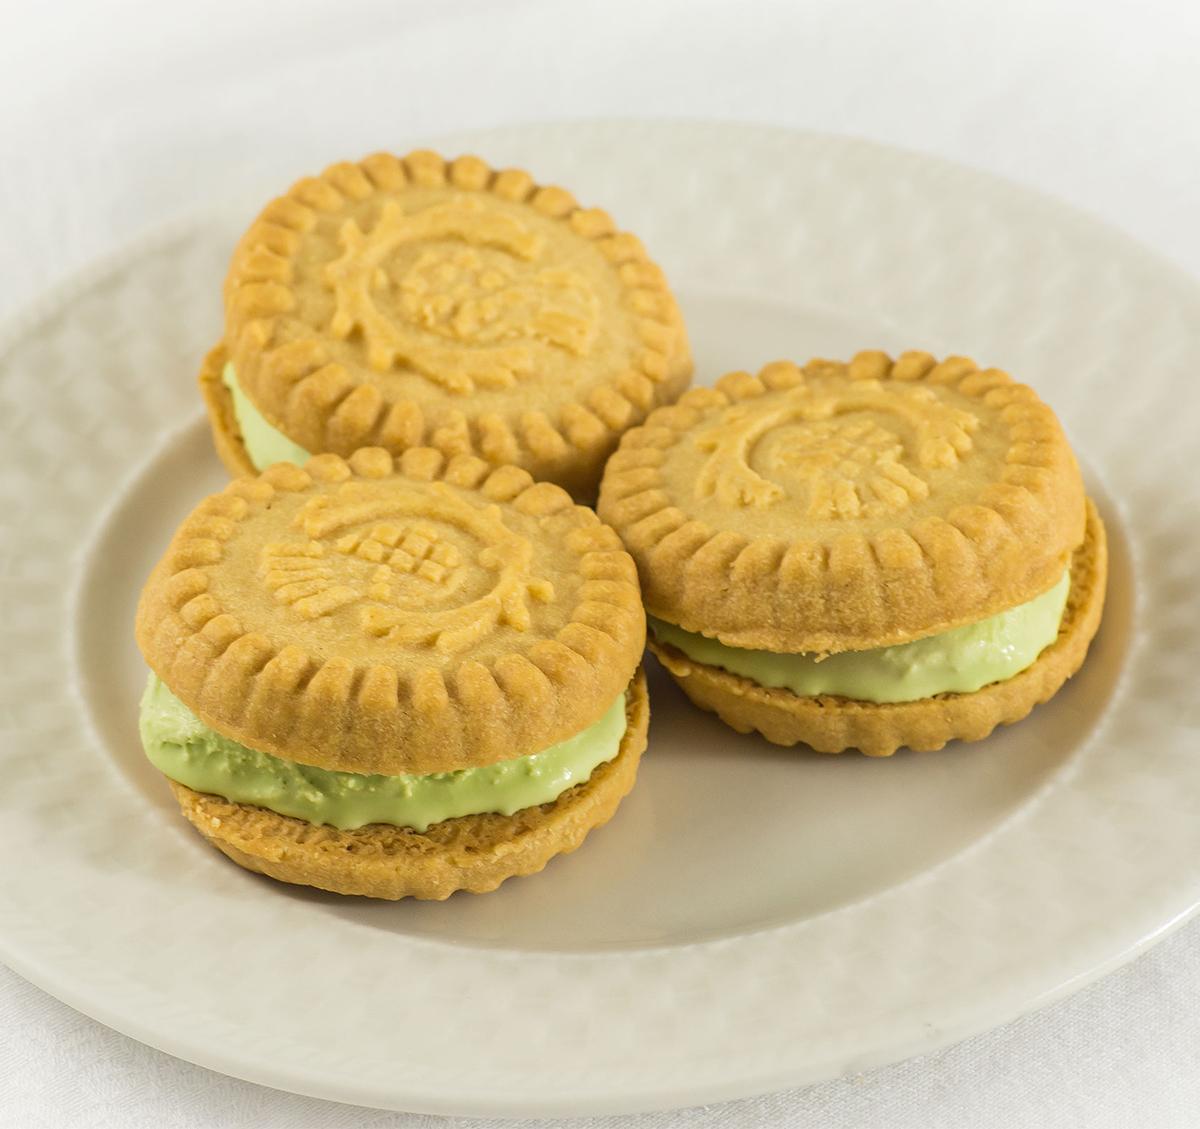 Green Tea Ice Cream Sandwiches